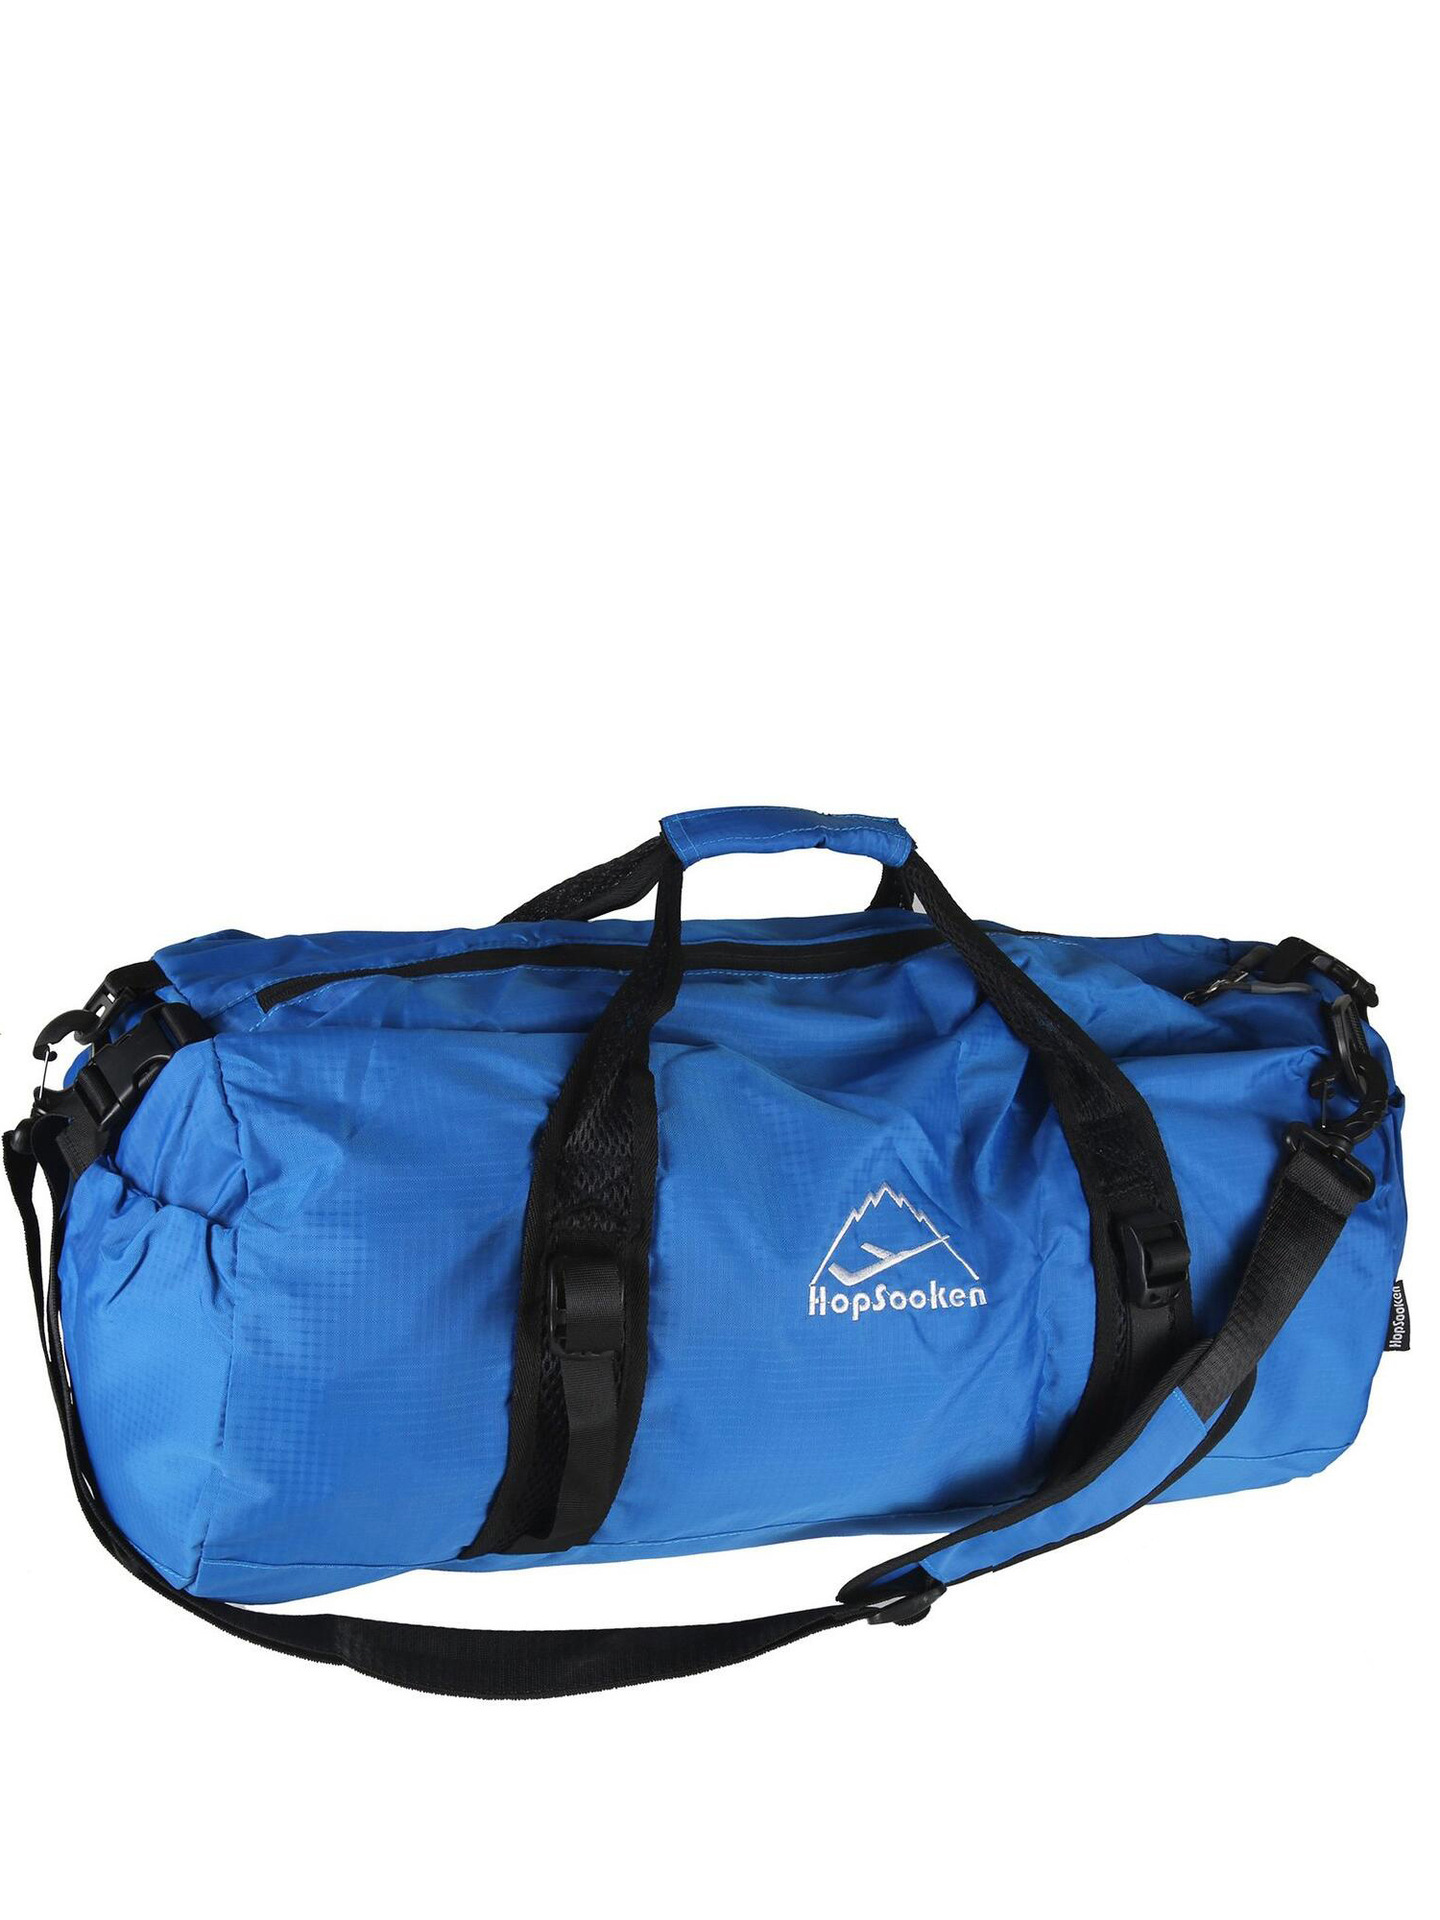 Hopsooken Travel Duffle Gym Bag Large Sport Women Men Foldable Waterproof Luggage Duffle Bag (50L, Blue) by